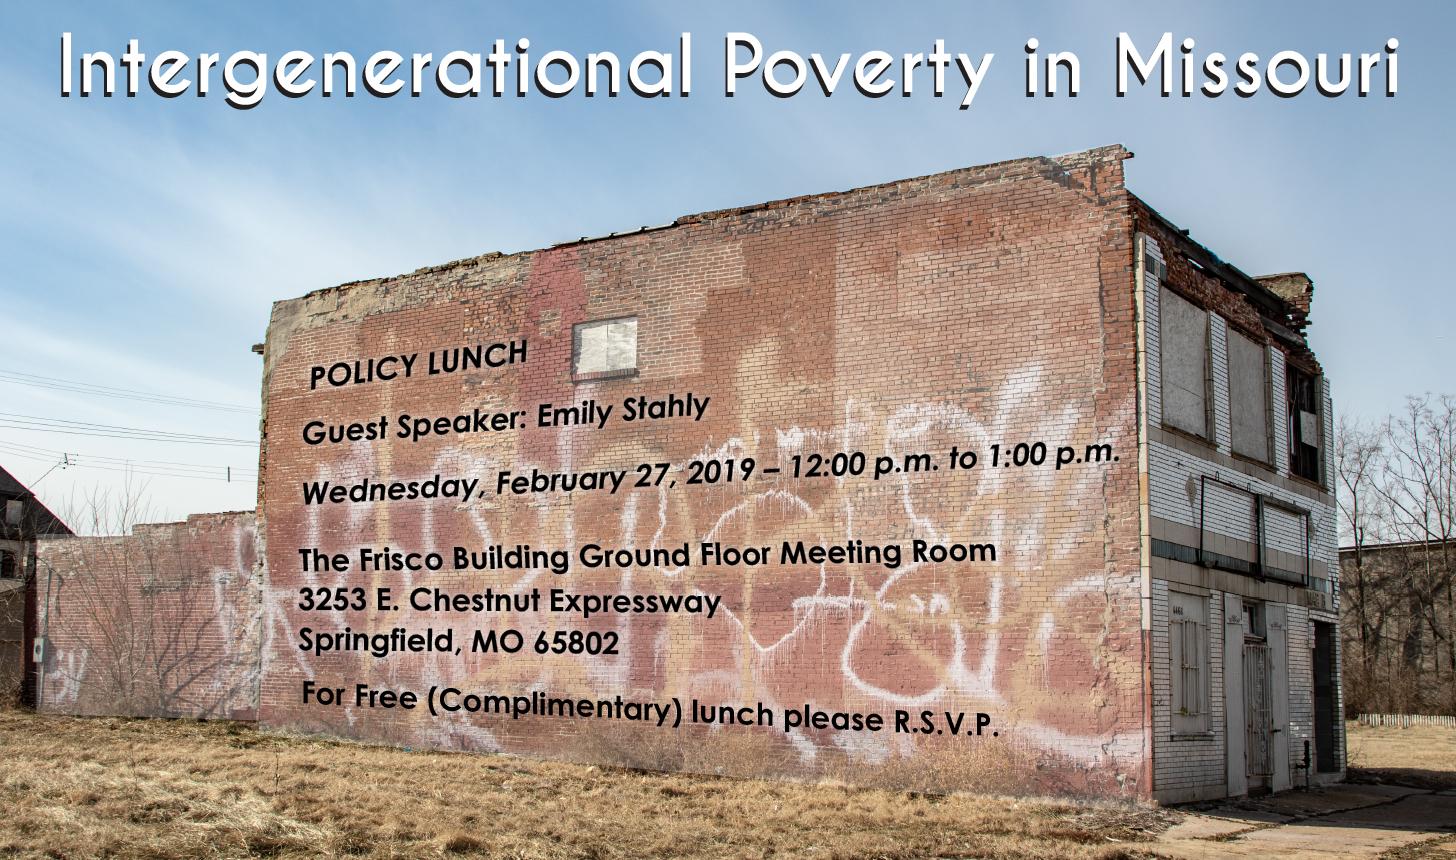 Intergenerational Poverty